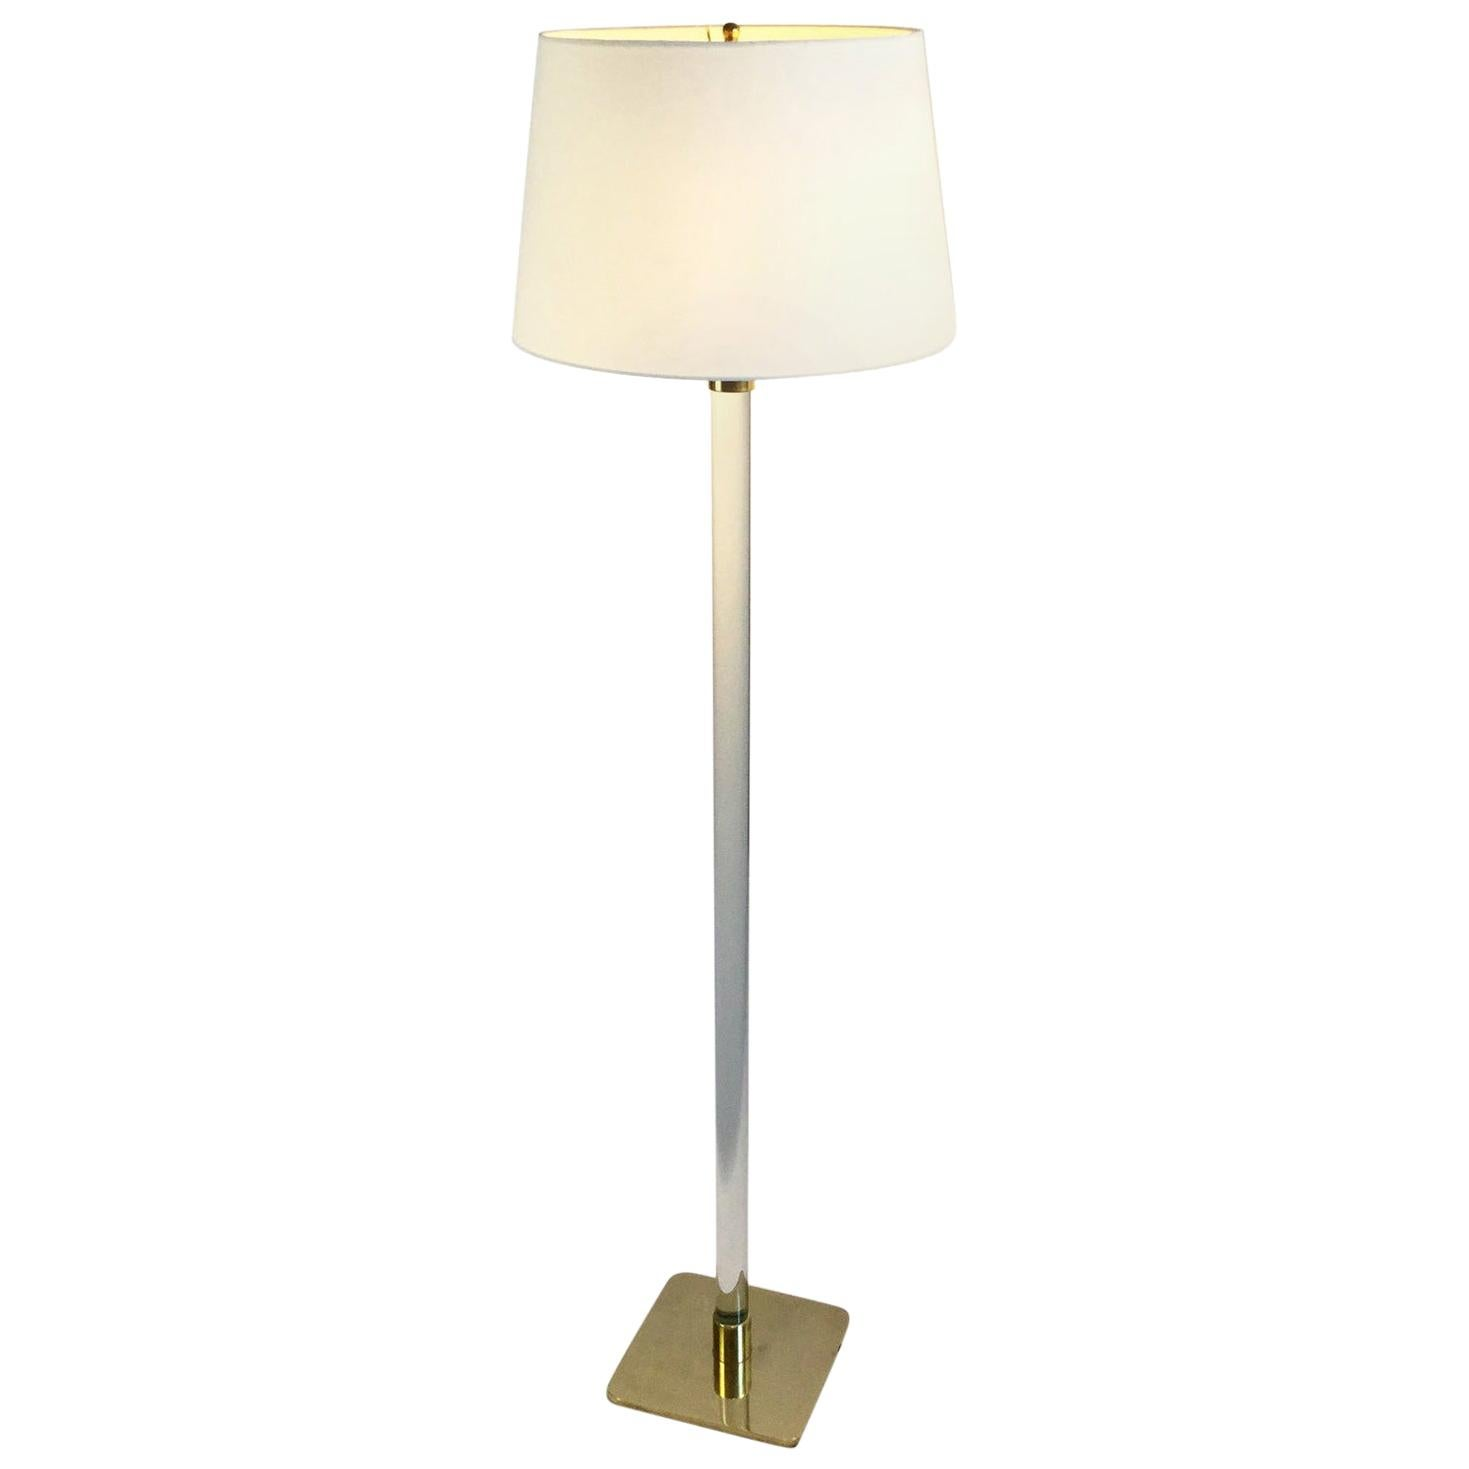 Hansen Brass and Glass Floor Lamp by Hansen Lighting Company, New York, 1970s